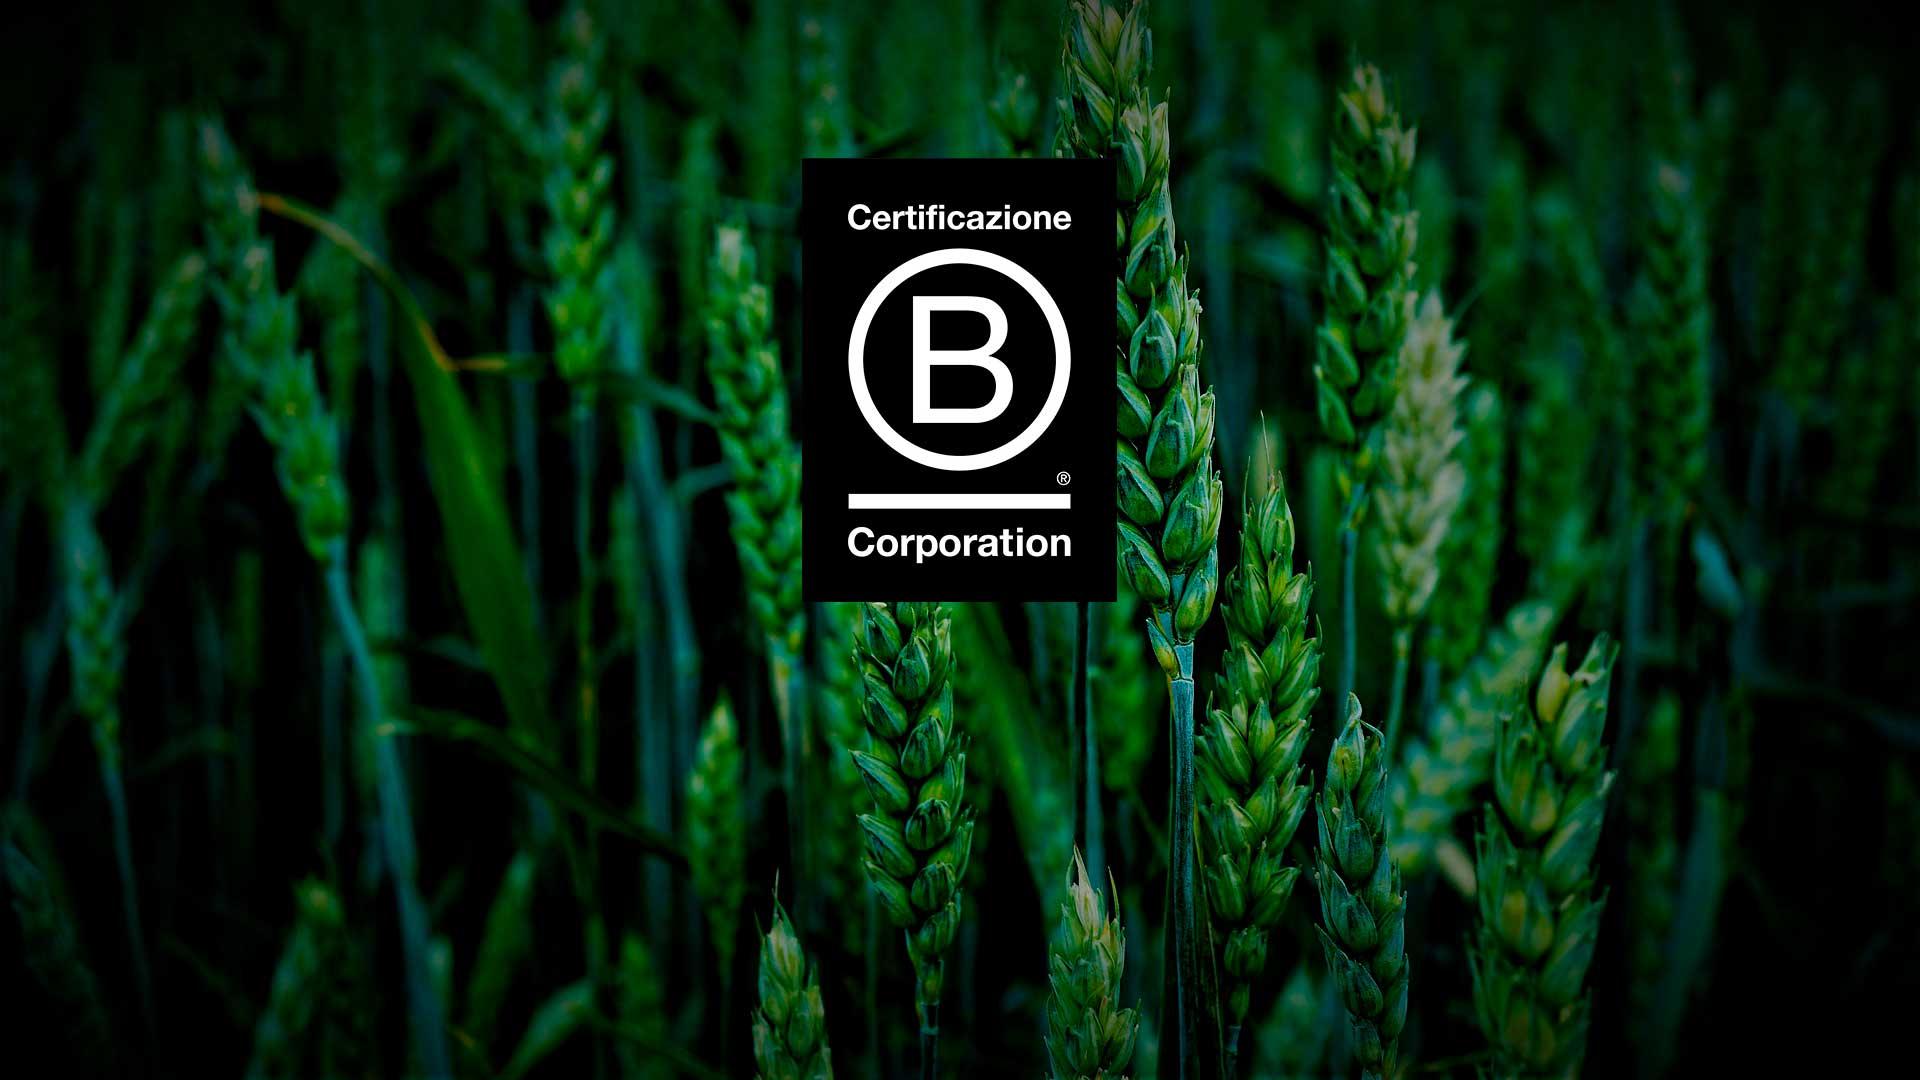 B-Corporation_Garc_Carpi_Modena_Costruzioni_Ambiente_